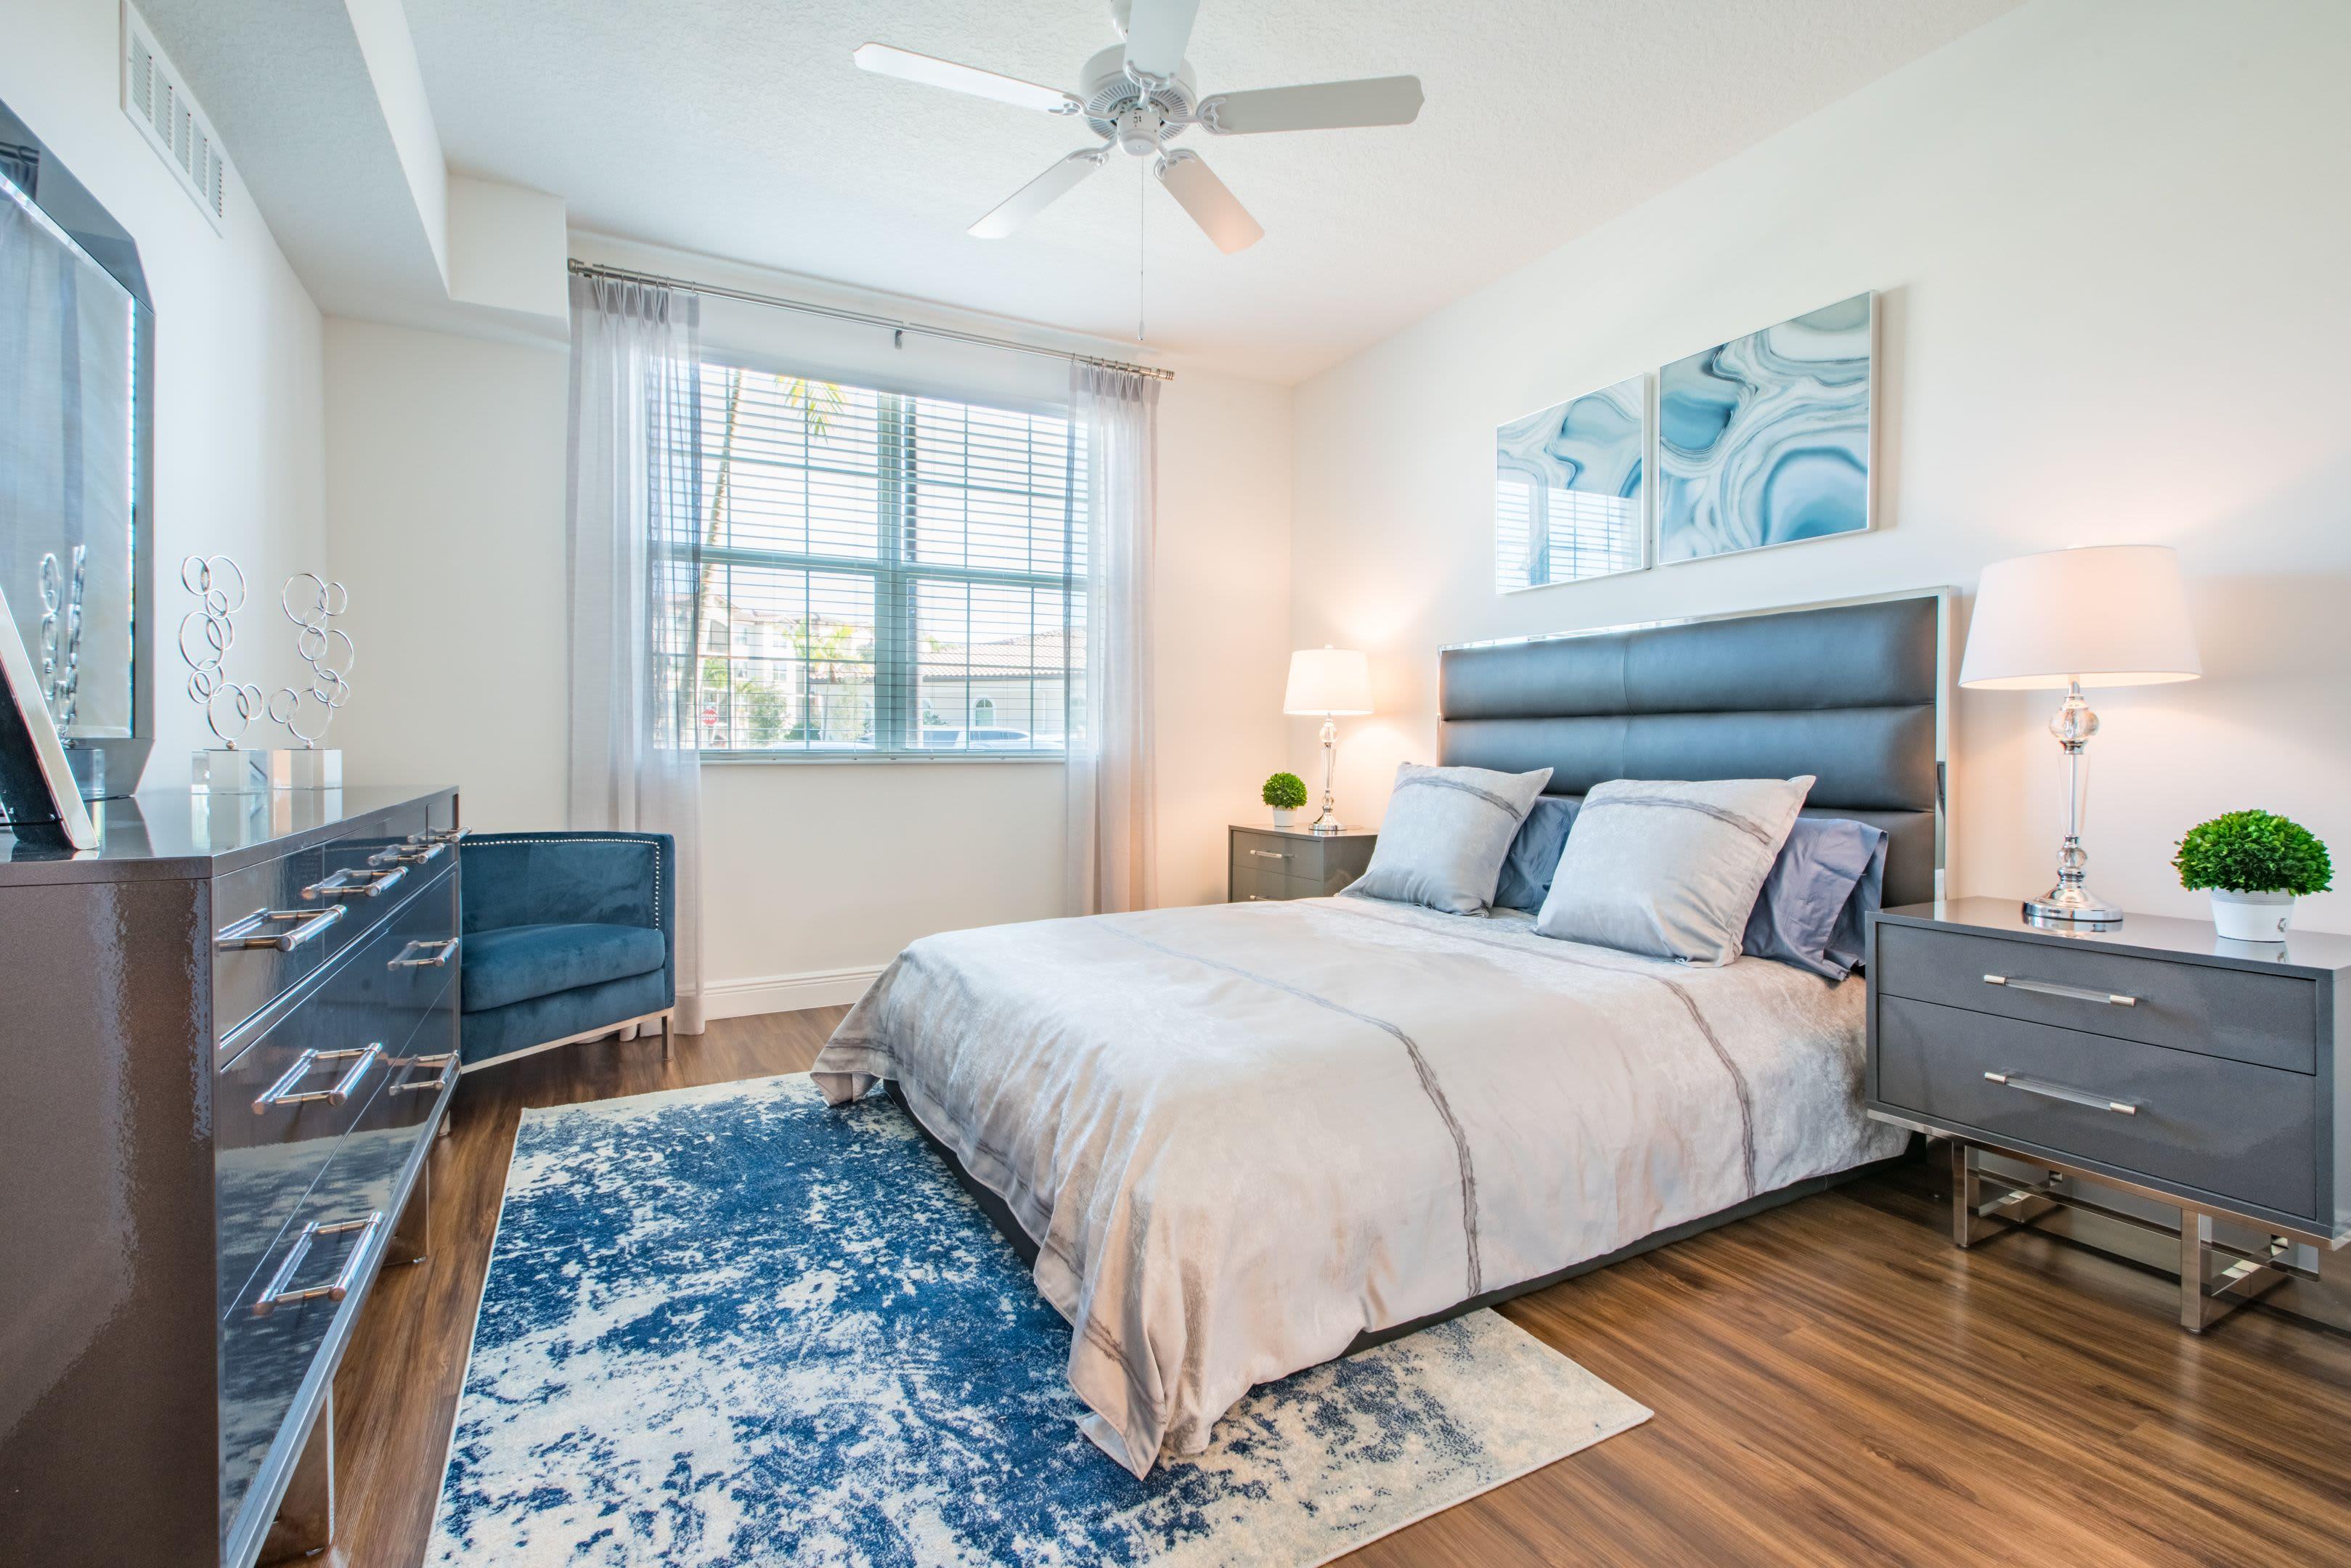 Bedroom Area at Luma Miramar Apartments in Miramar, Florida.